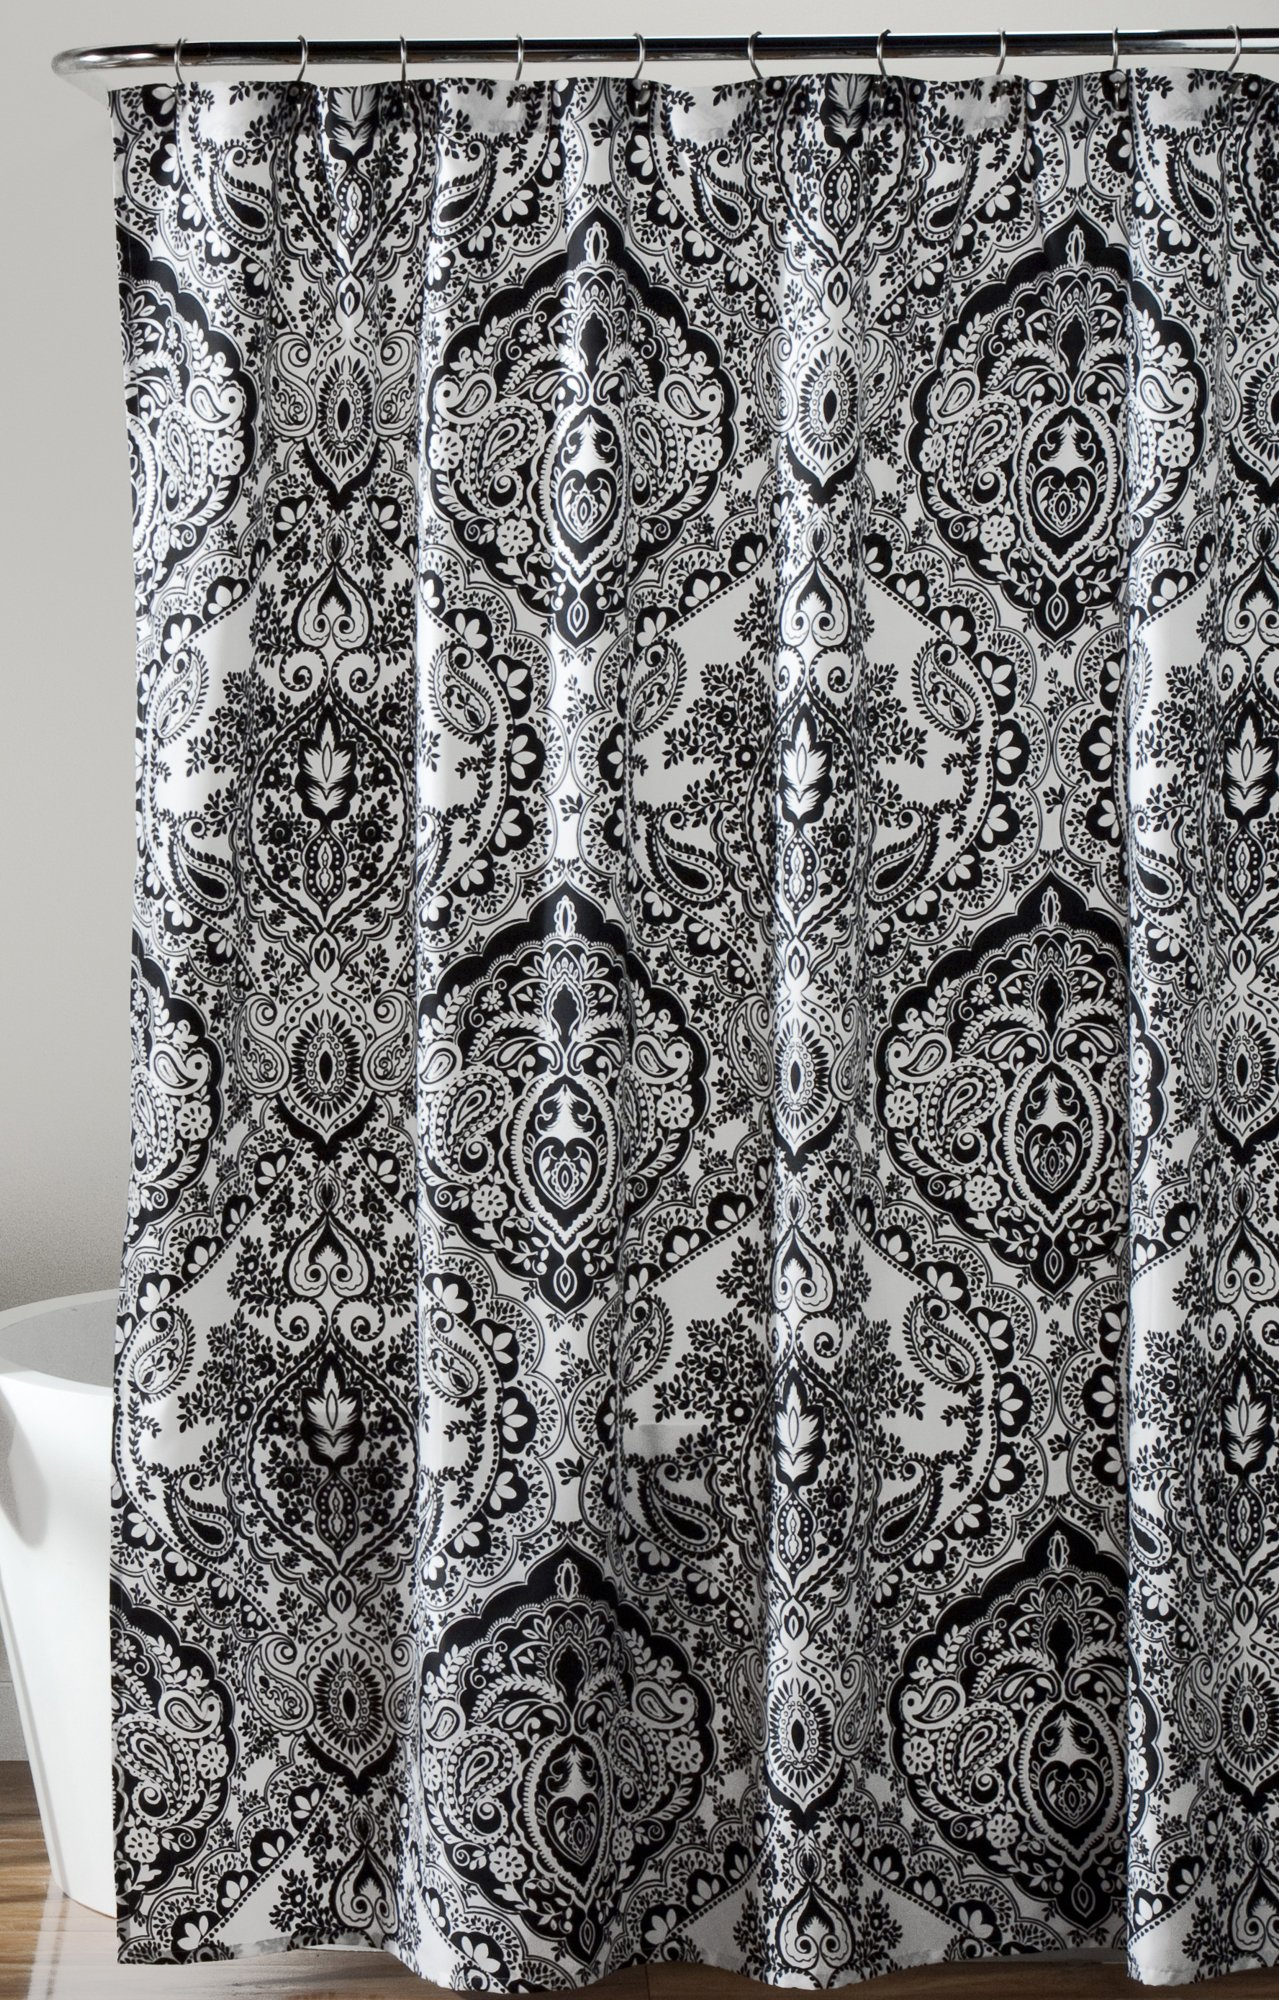 Lush Decor Aubree Shower Curtain, 72 x 72, Black/White